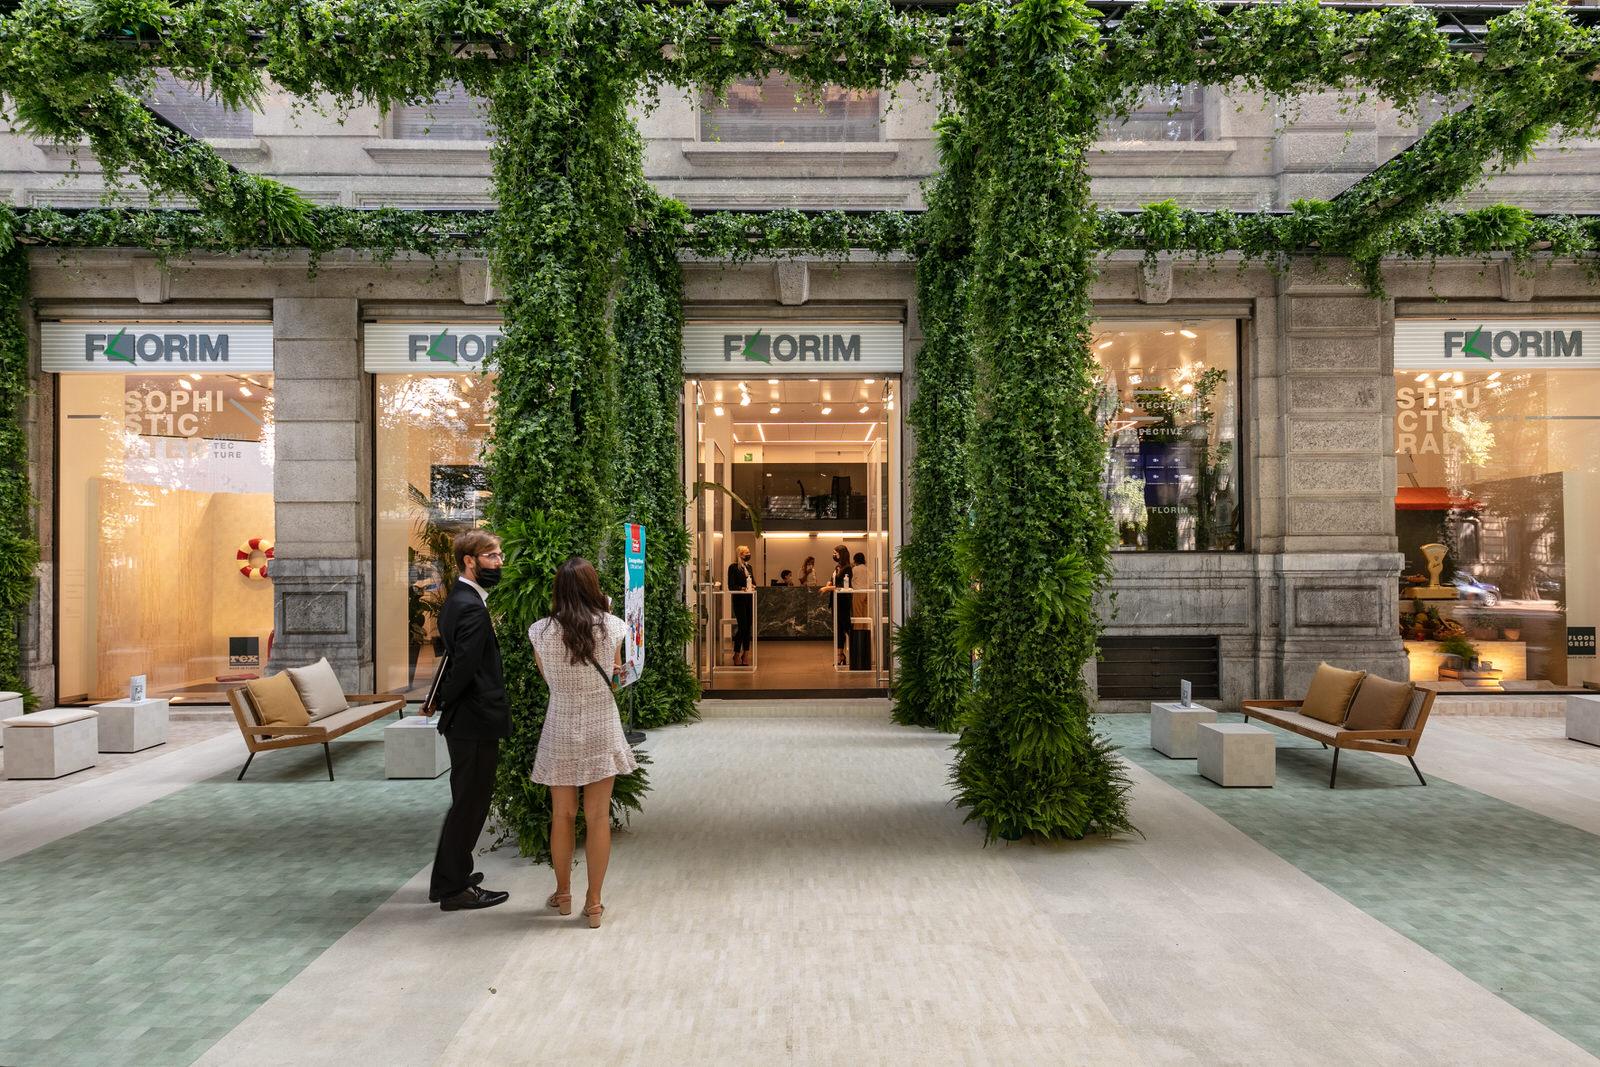 Florim Sensi Pigmenti Installation Milan Design Week 2021 Yellowtrace 07a